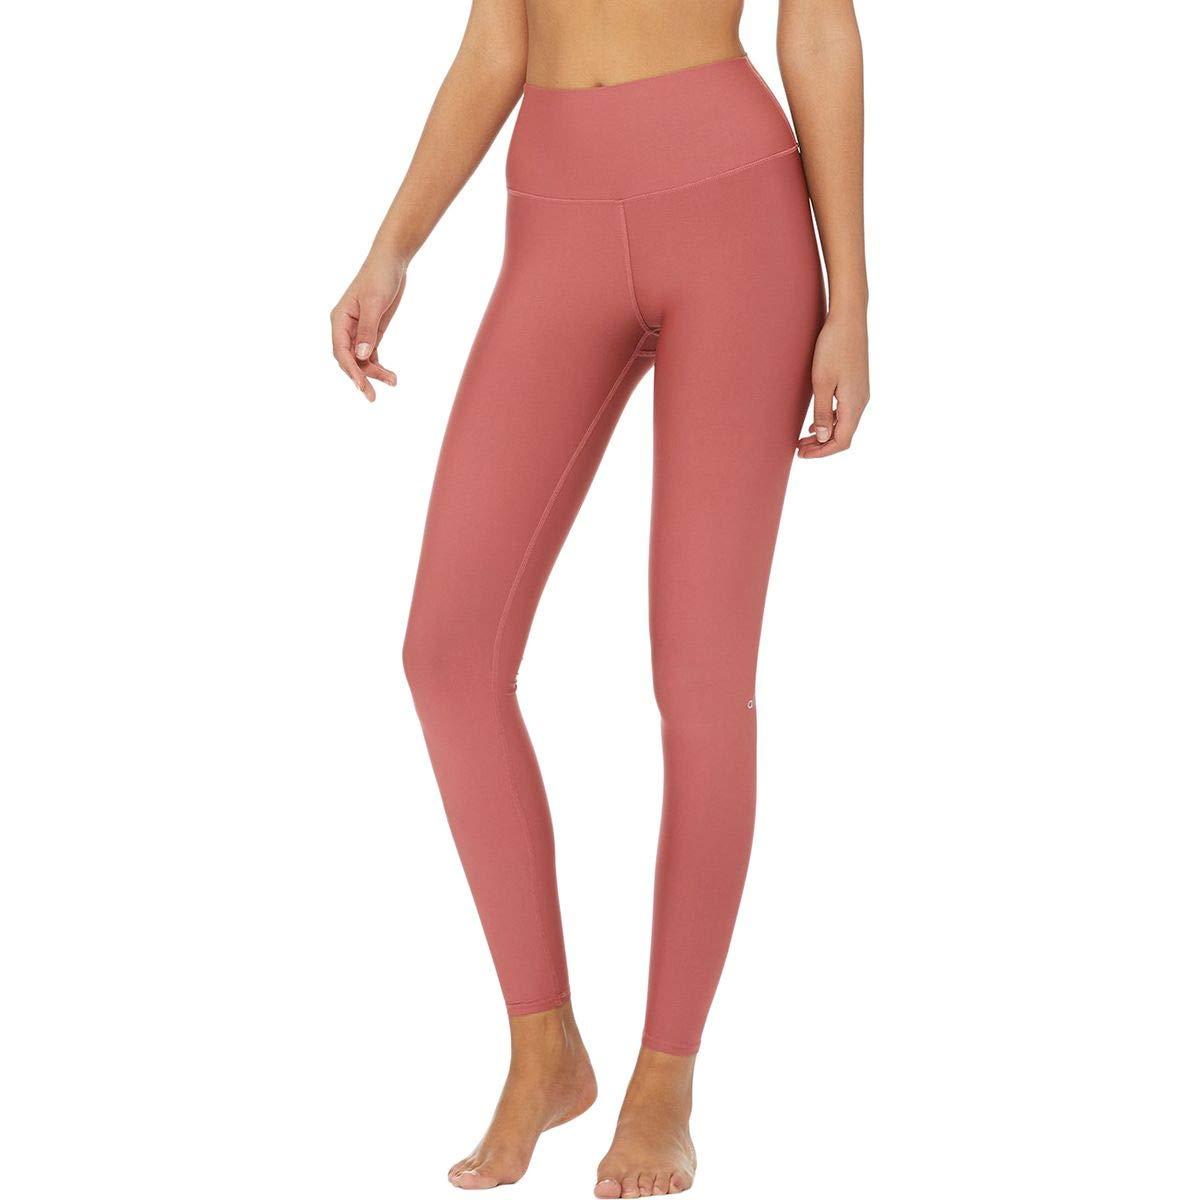 Alo Yoga High-Waist Airlift Legging - Women's Rosewood, M